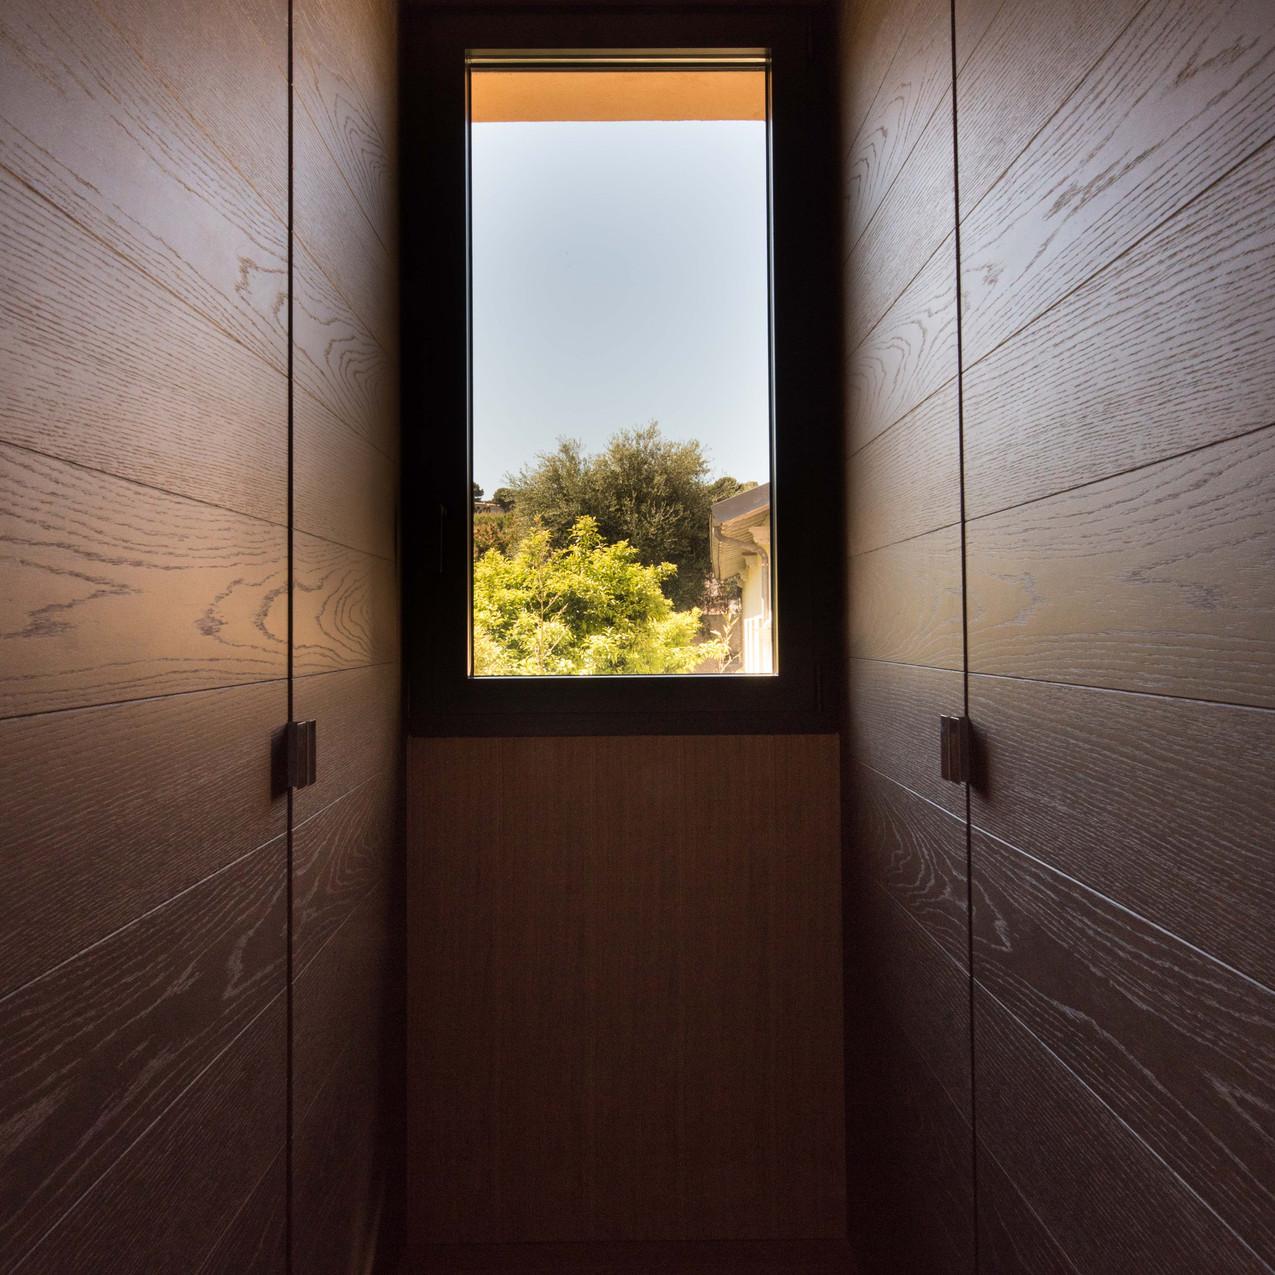 photographe architecture nice france french riviera paca cote dazur interieur-85